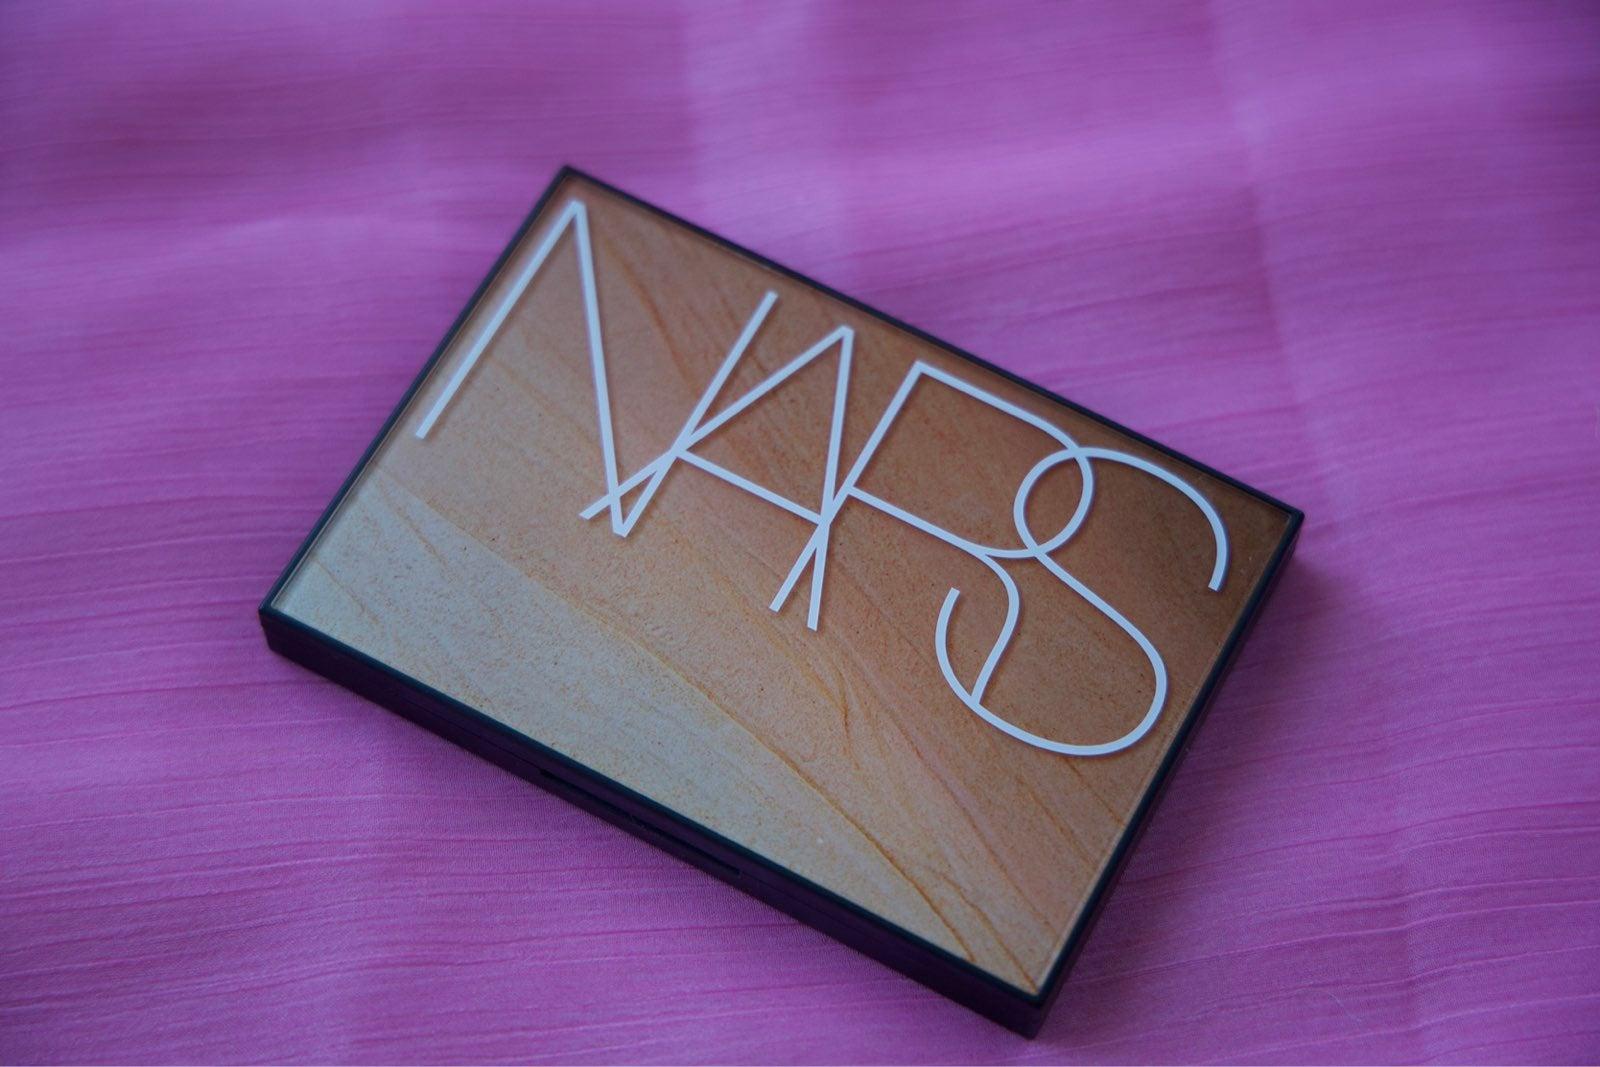 NARS summer lights face and eyes palette